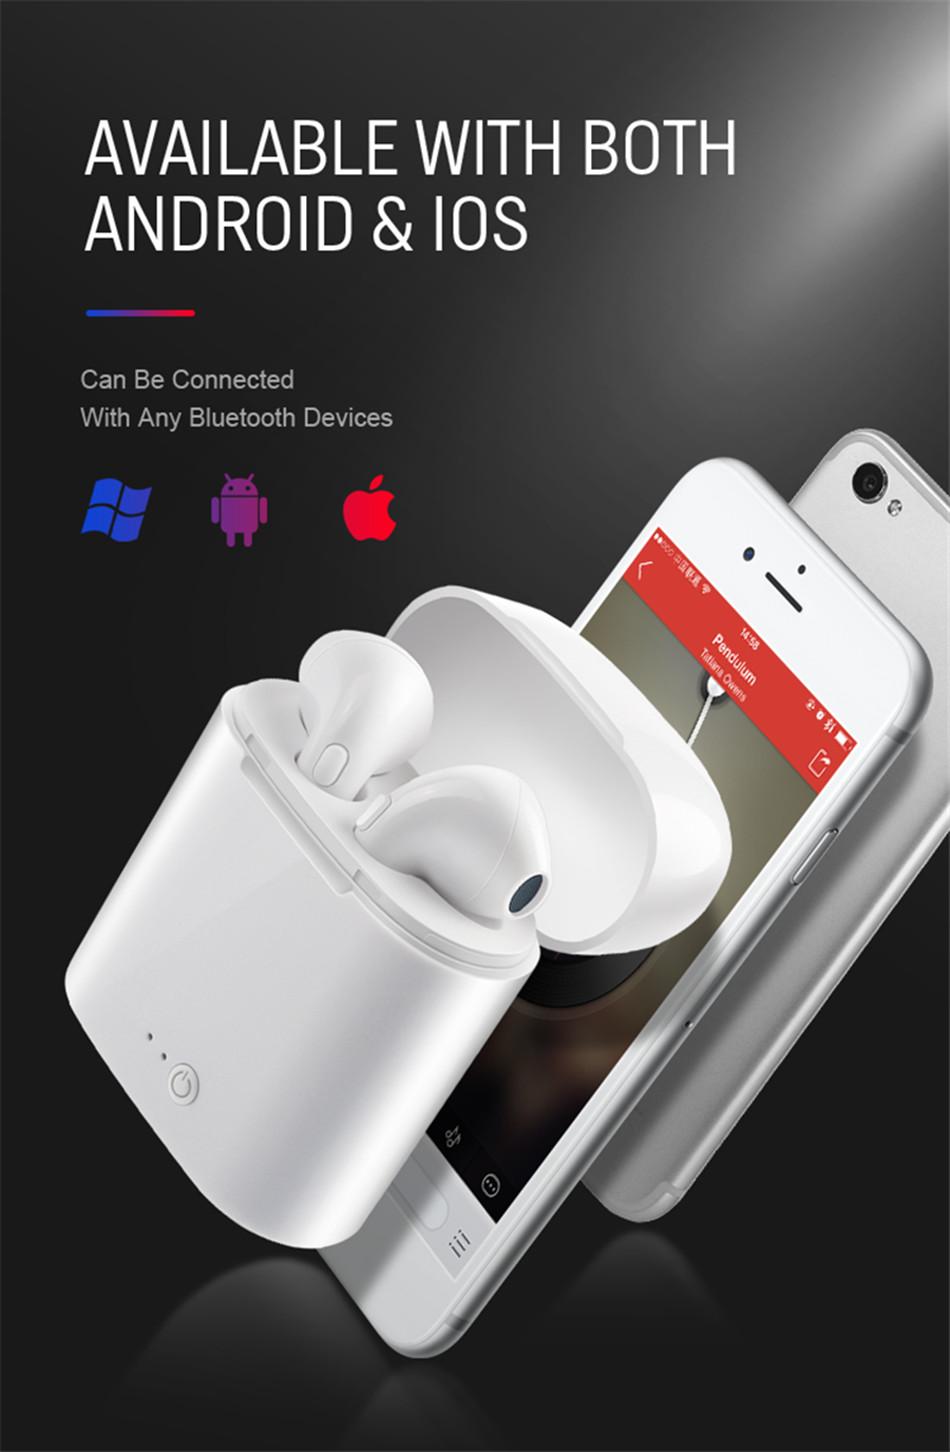 i7s TWS Wireless Earpiece Bluetooth 5.0 Earphones sport Earbuds Headset With Mic For smart Phone Xiaomi Samsung Huawei LG 5